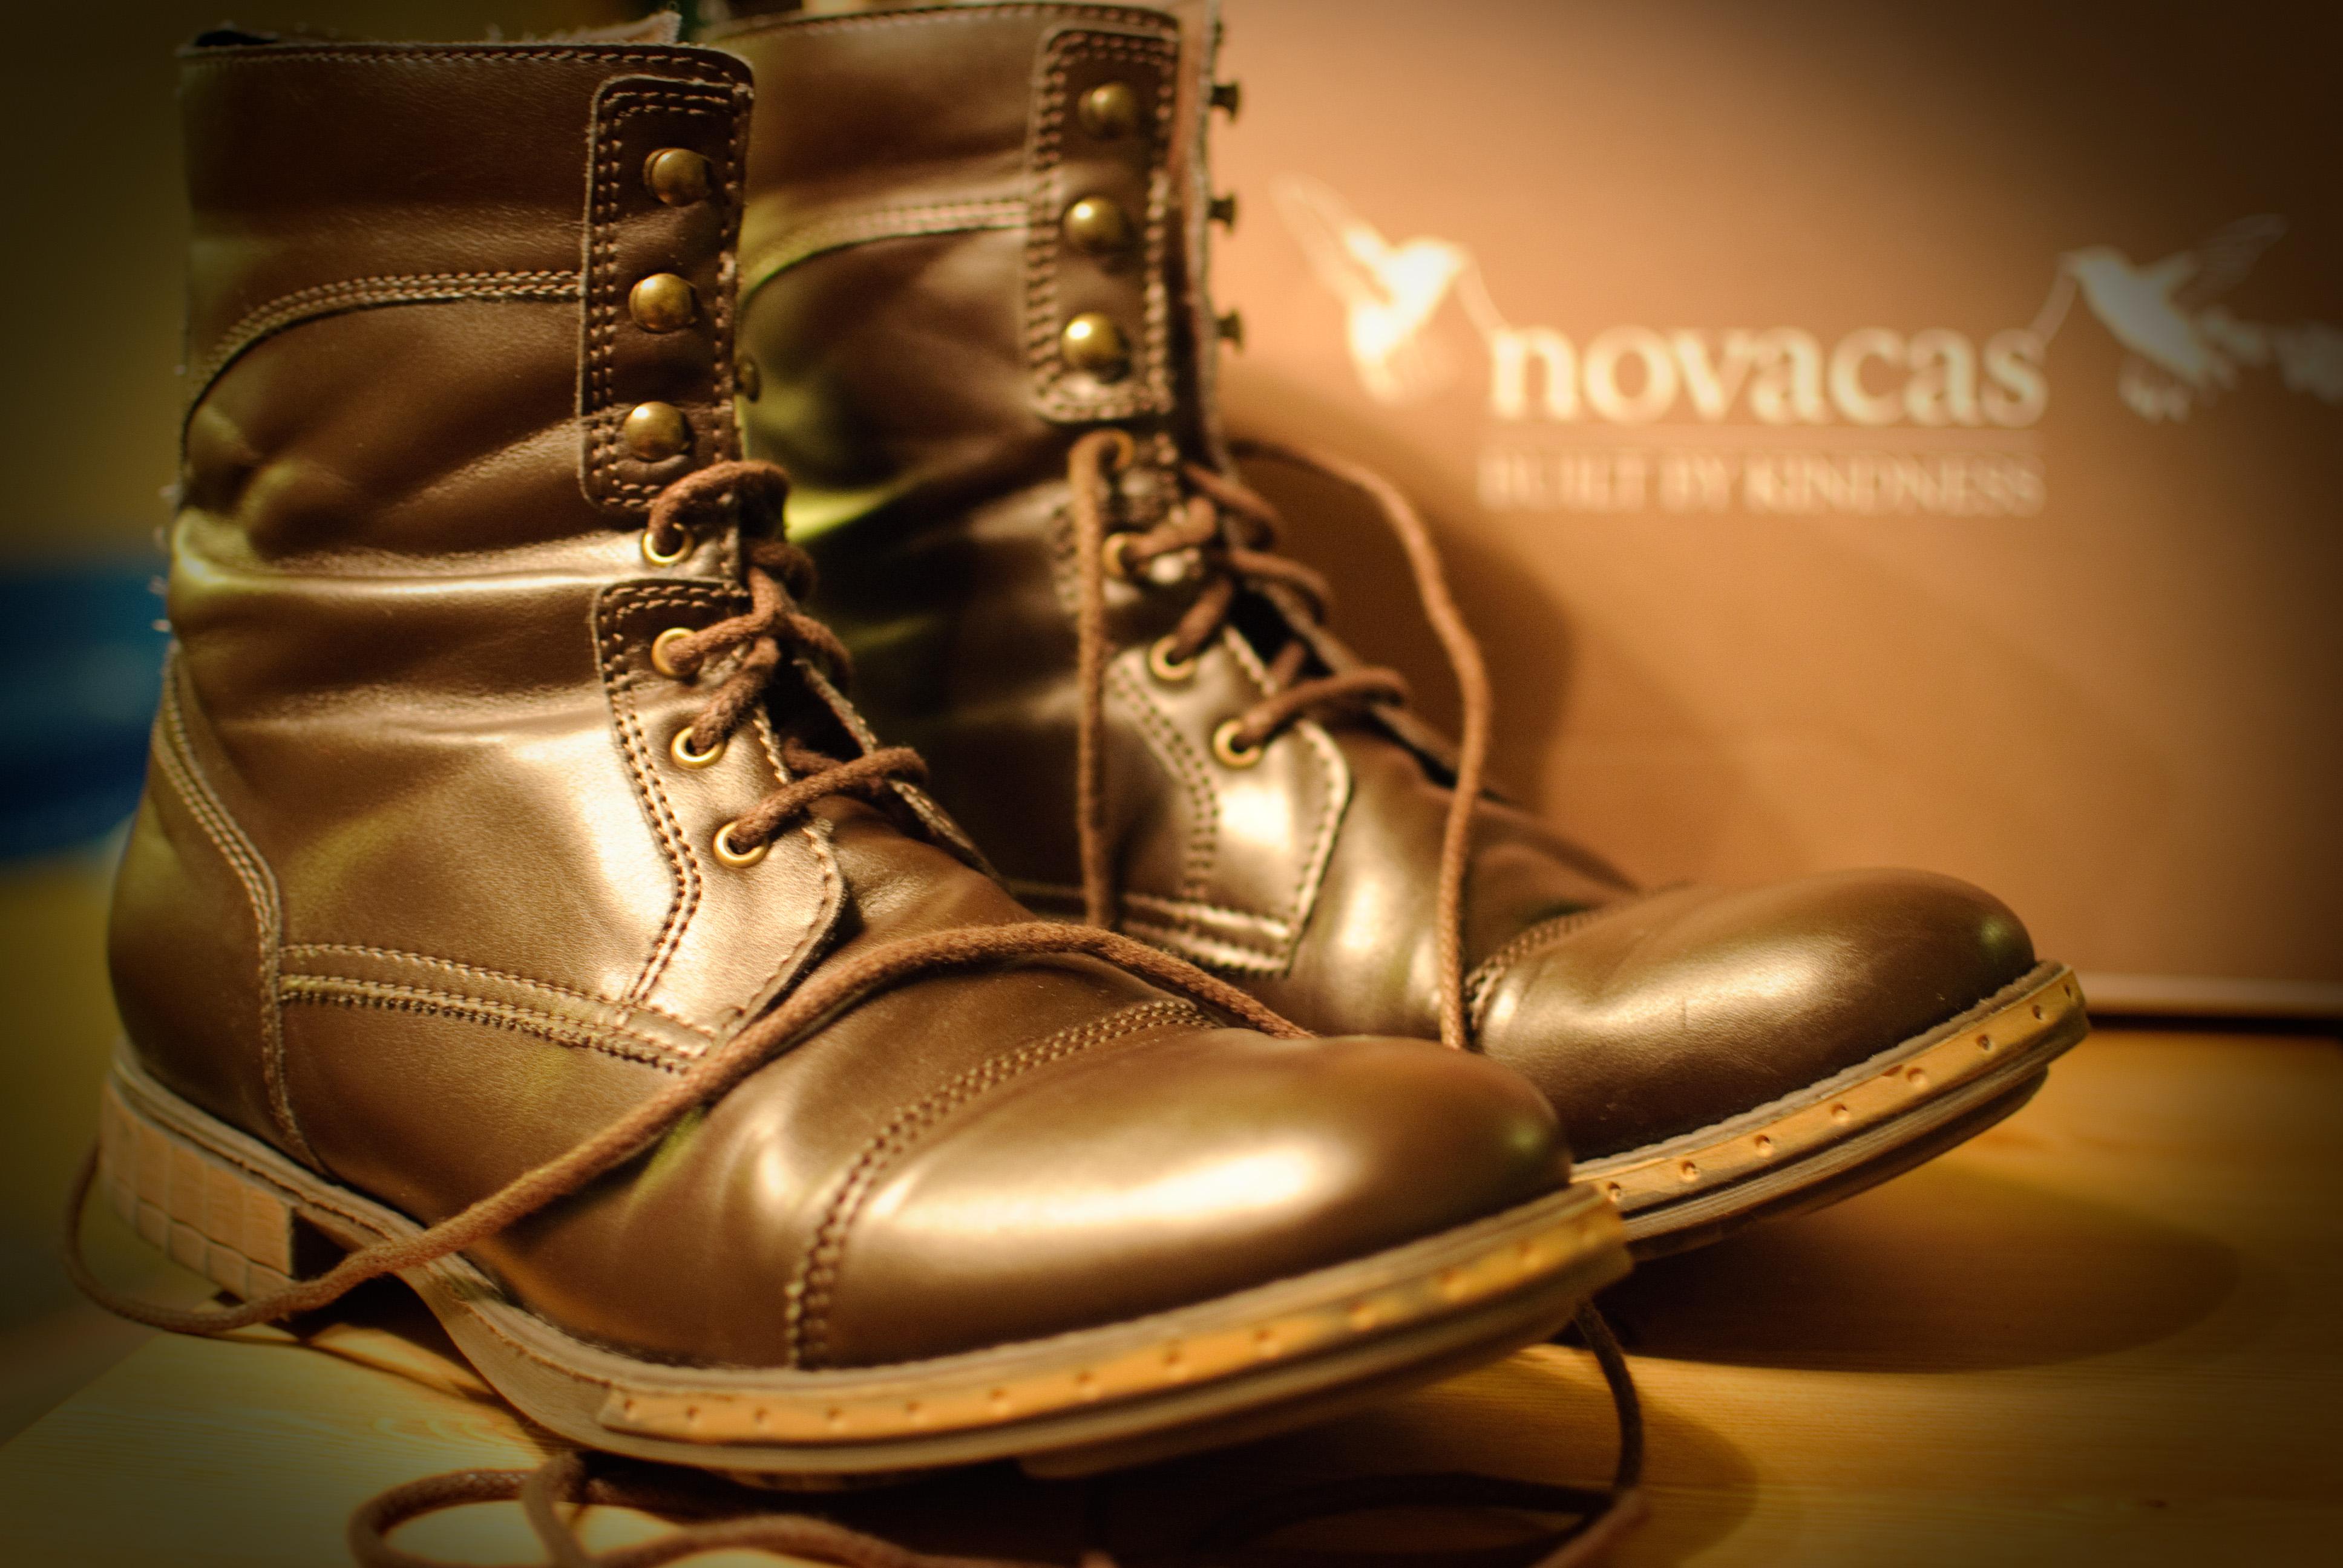 Novacas Amelia Clog Womens Apparel at Vickerey